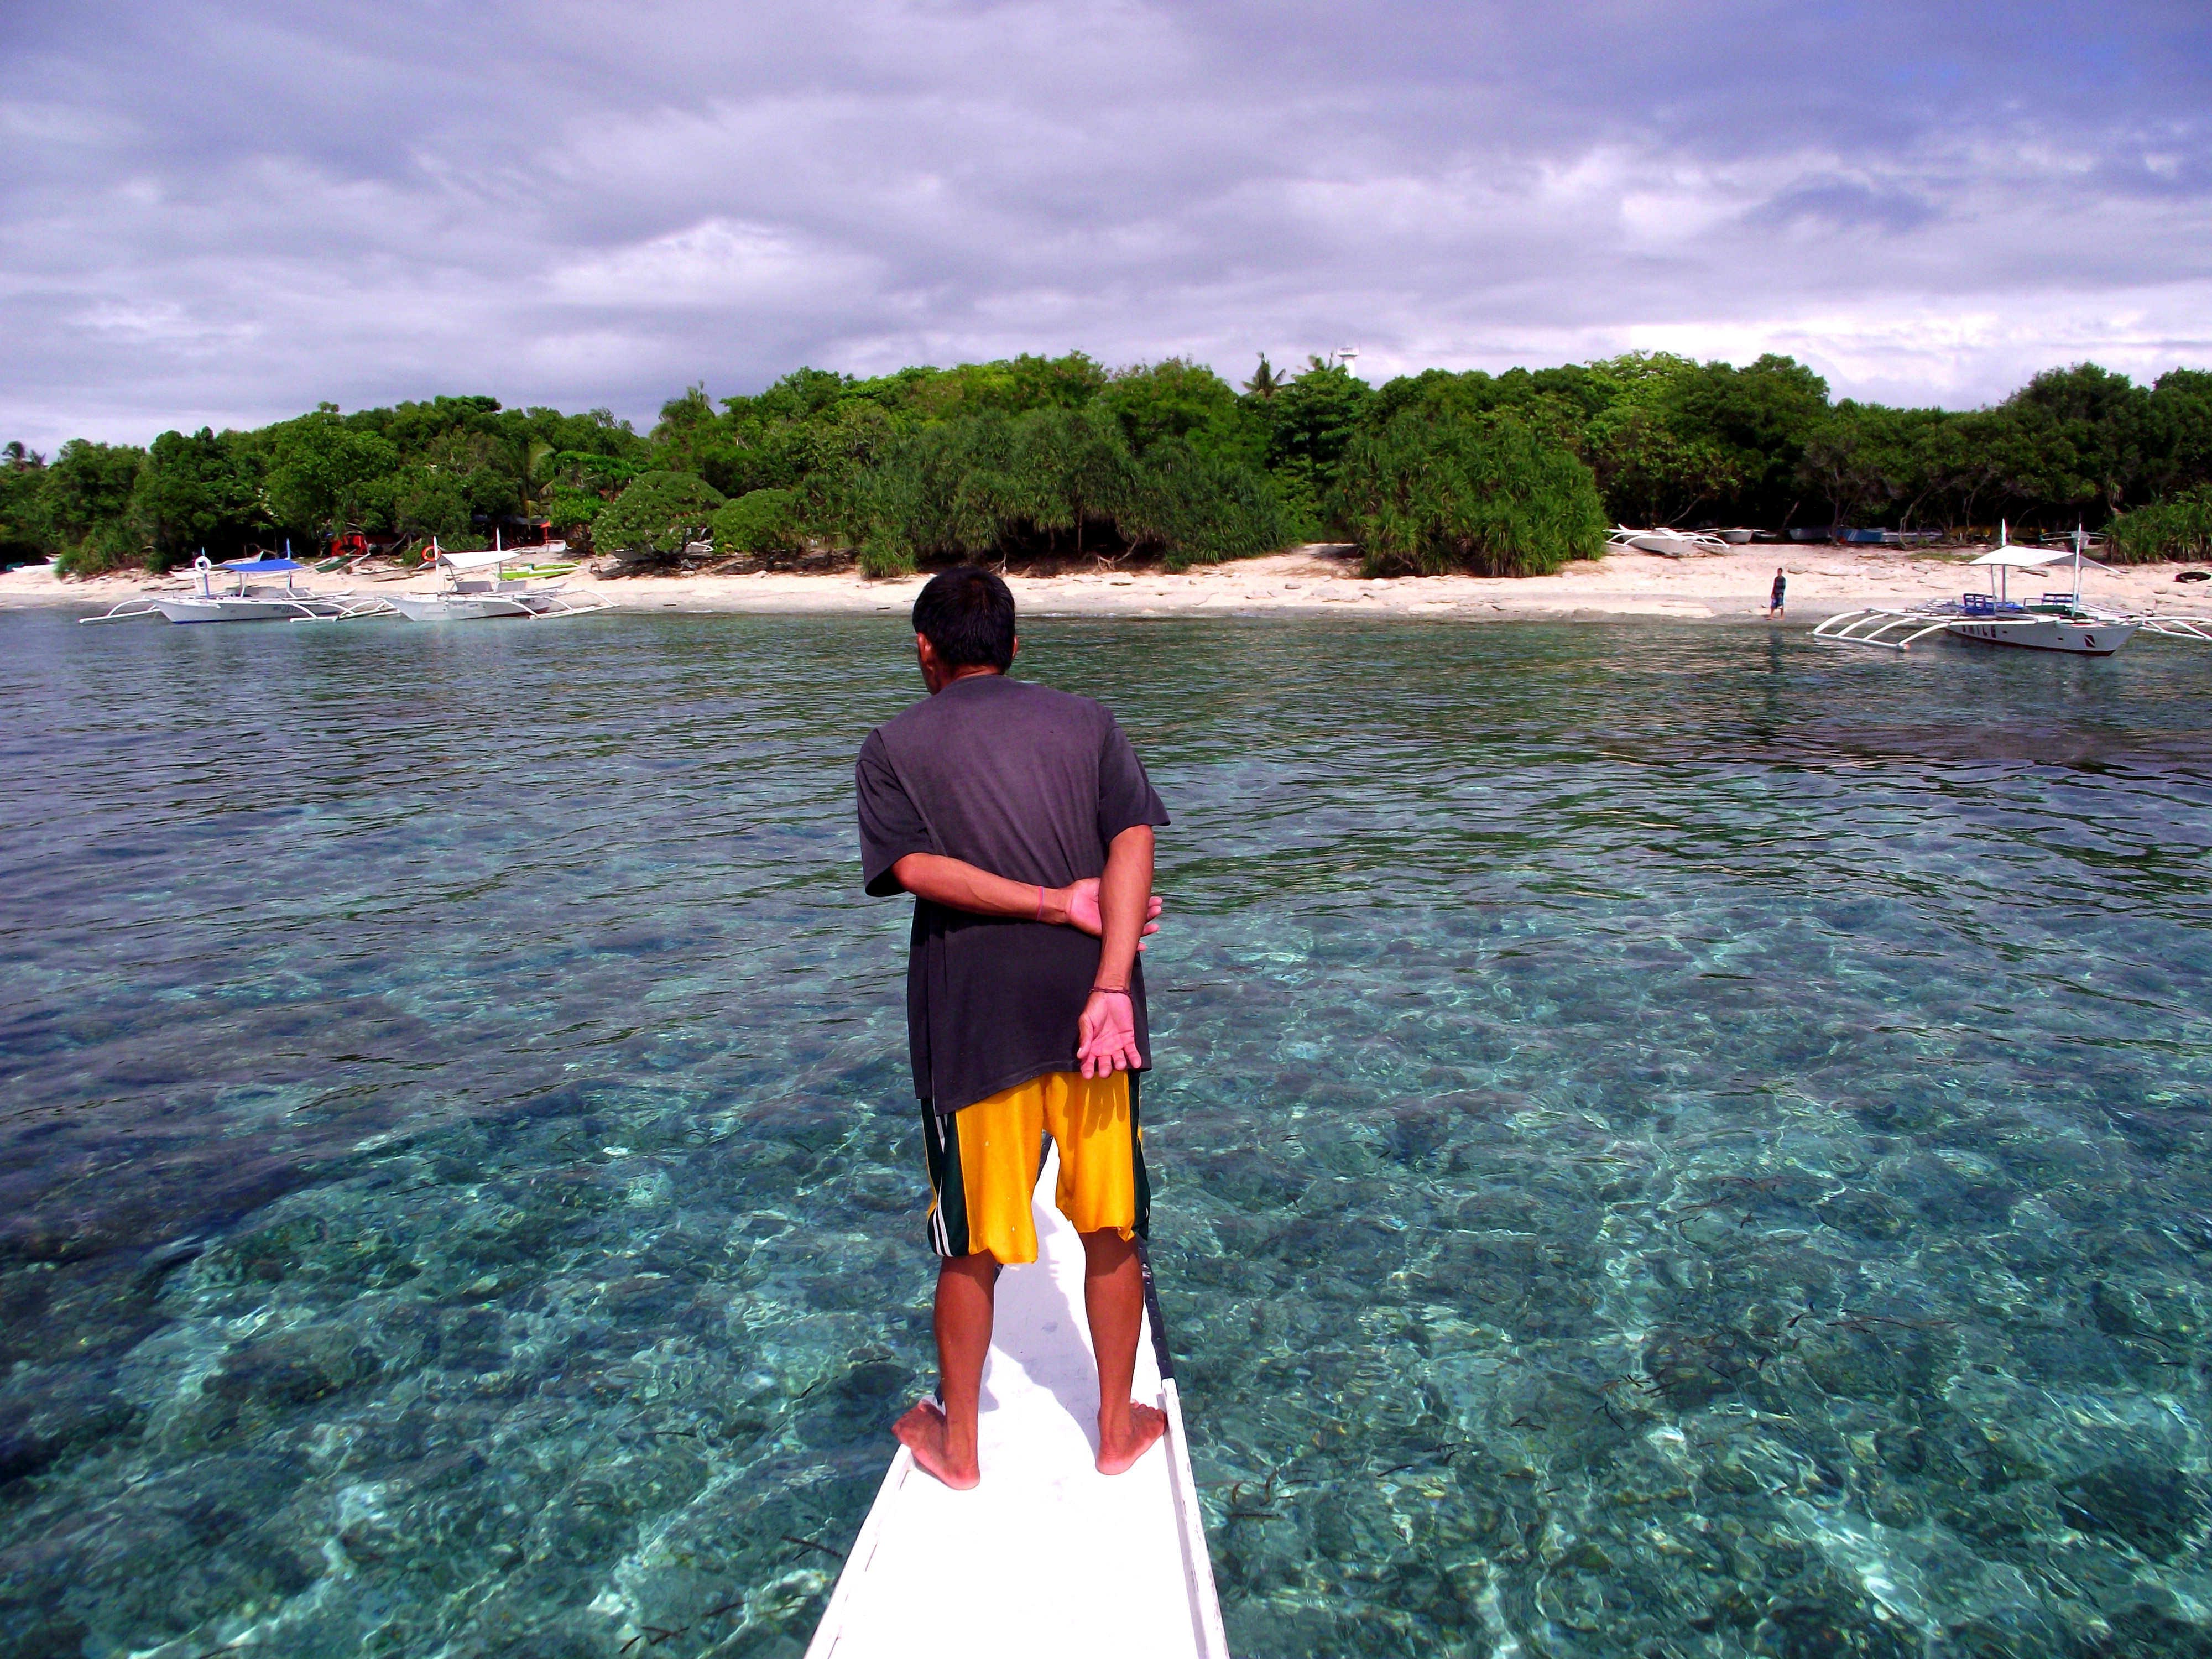 【i旅行】4天4000余元用英文9单词细游菲律宾宿务、薄荷、长滩等9岛6城镇(上篇) 一、简述 2013年11月28日12日1日4天里,我花了4000余元,6次飞行,用英文9个单词,很仔细地游览了菲律宾宿务、薄荷、长滩等9岛6城镇。 6次飞行:上海往返马尼拉、马尼拉往返宿务、马尼拉往返长滩。 9岛6城镇:9岛吕宋岛、麦克坦岛、宿务岛、薄荷岛、邦劳岛、巴黎卡萨岛、处女岛、班乃岛、长滩岛。马尼拉、宿务、塔克比兰、长滩、卡迪兰克、卡里波。 说是只会英文9个单词,当然不止,也没统计过,至少英语极差极差。 说